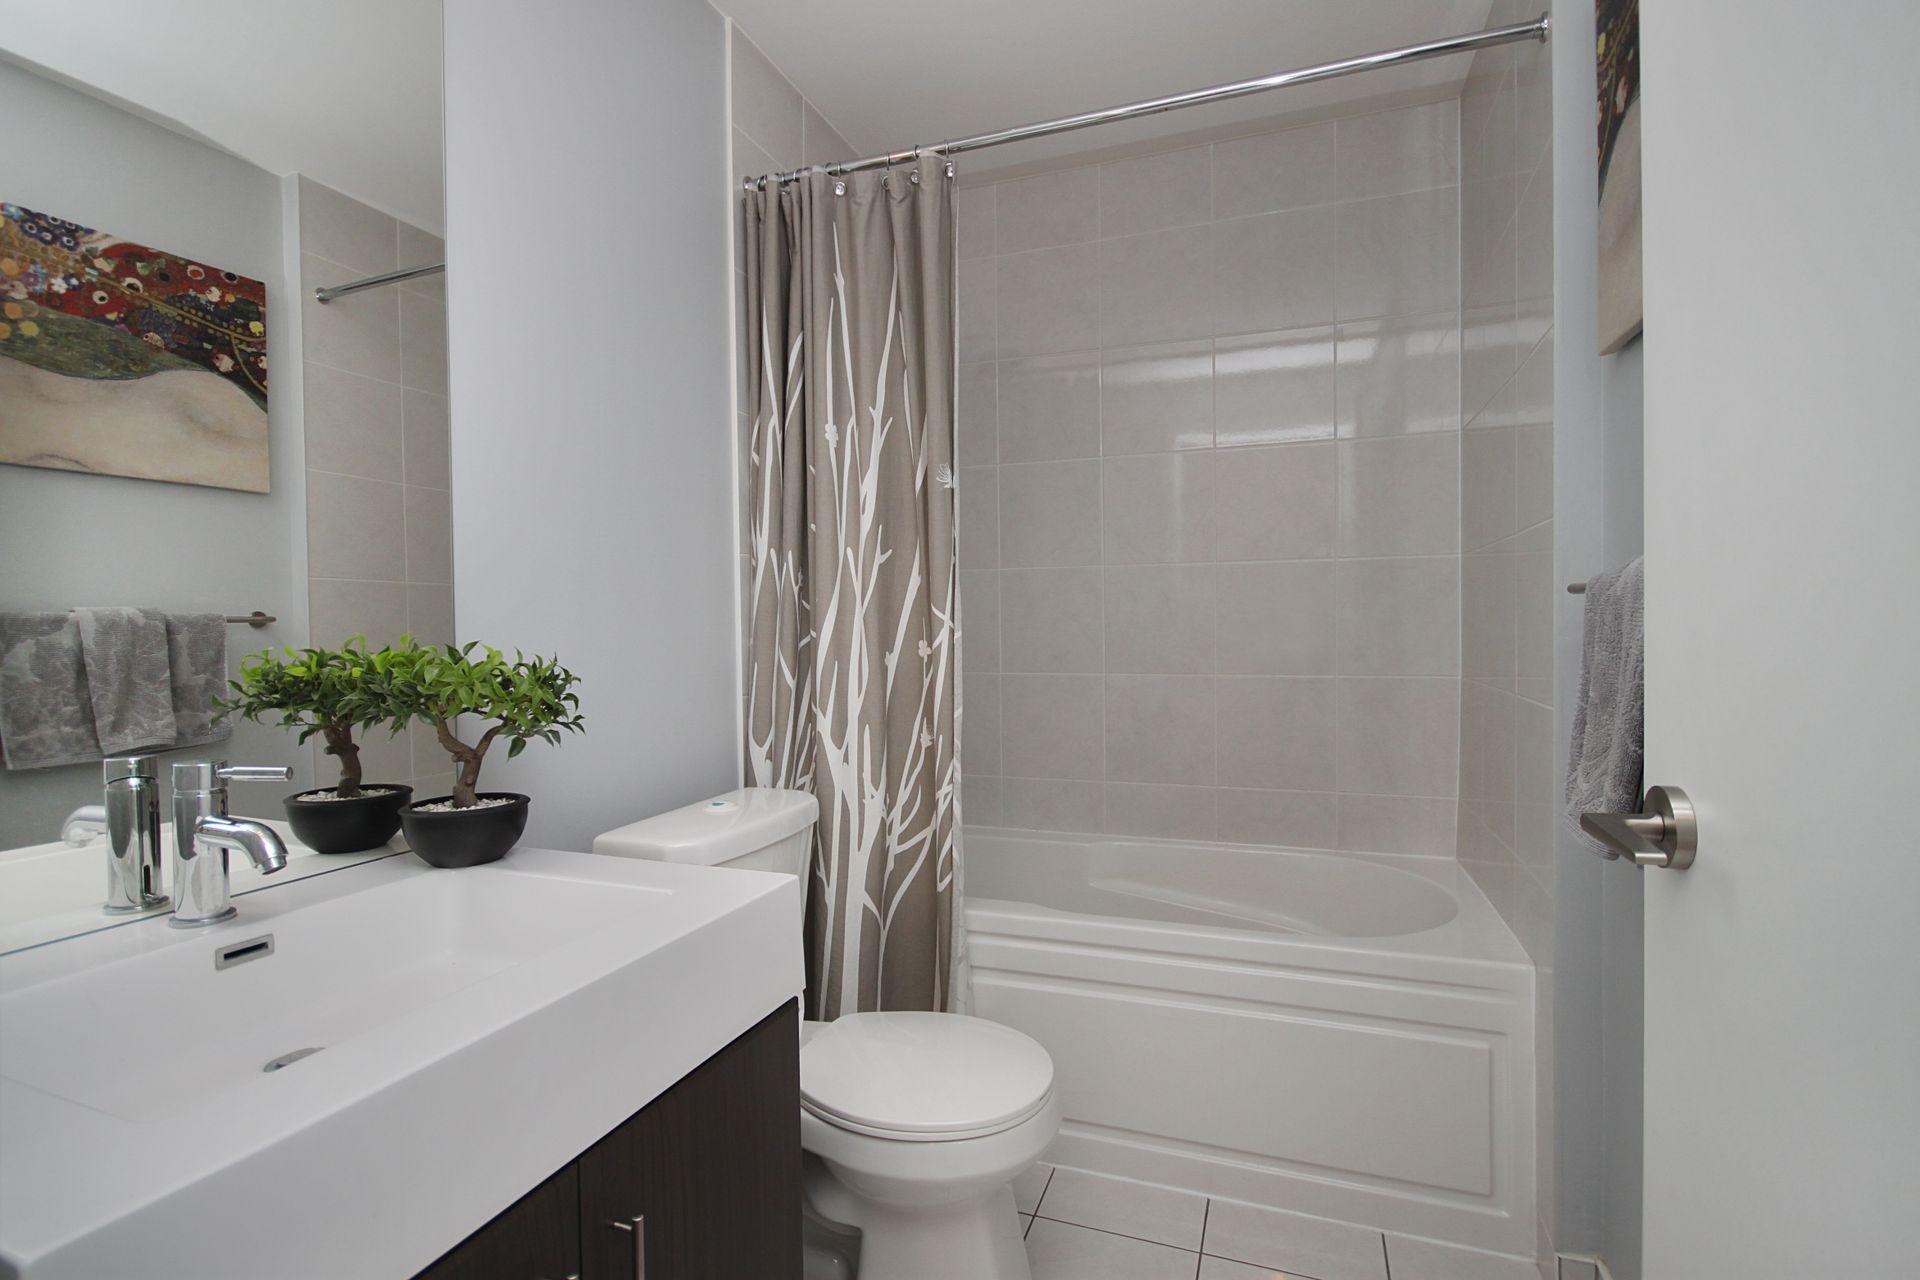 4 Piece Bathroom at 124 - 35 Brian Peck Crescent, Leaside, Toronto